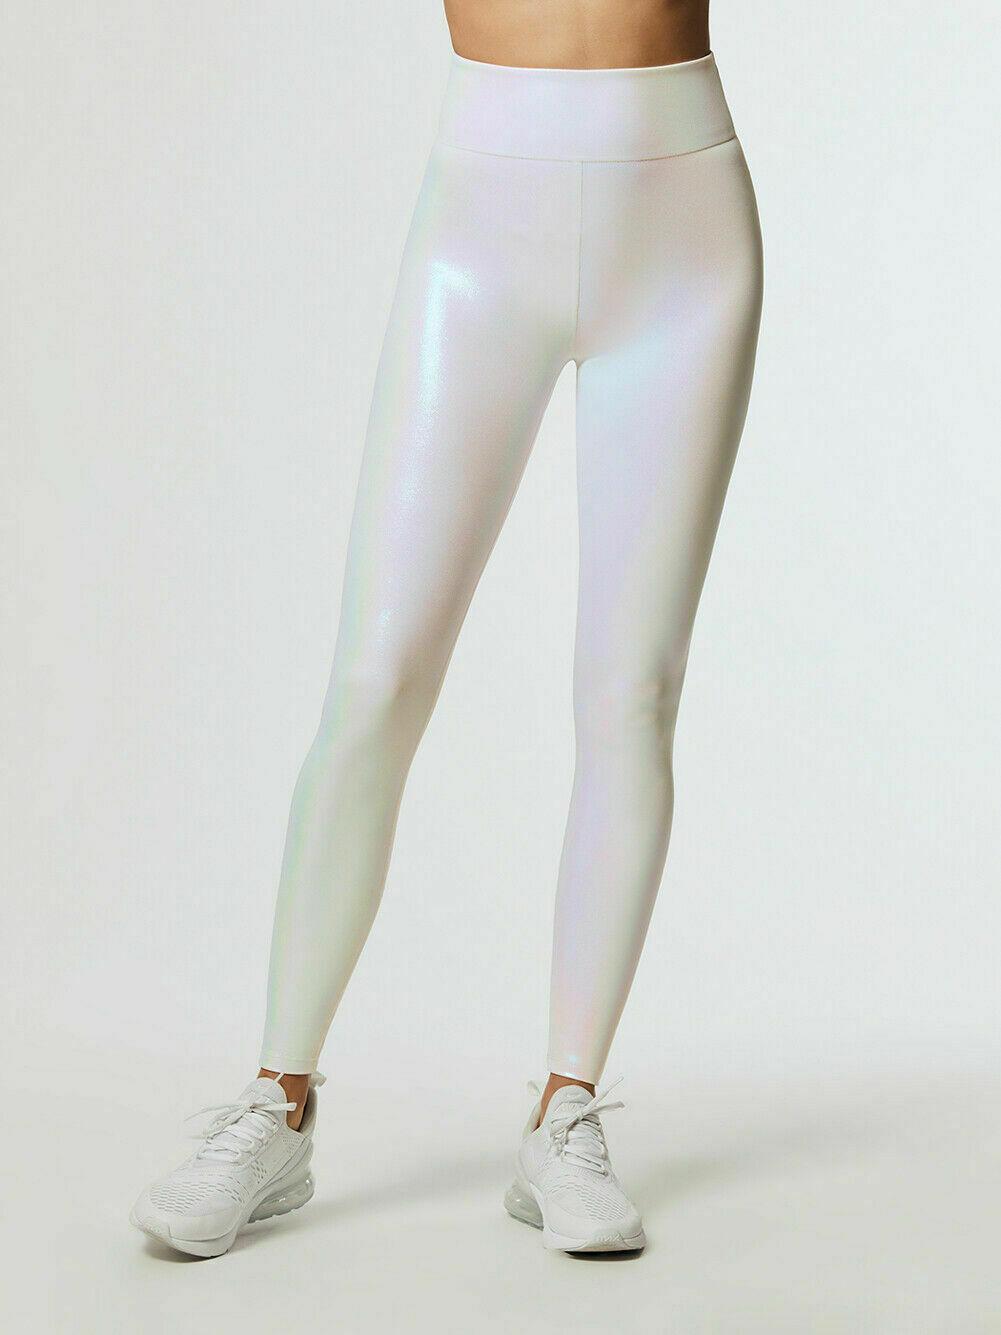 Black Leather Leggings Skinny Pencil Pants Women High Waist Stretch Slim Fashion Blue White PU Leather Pants